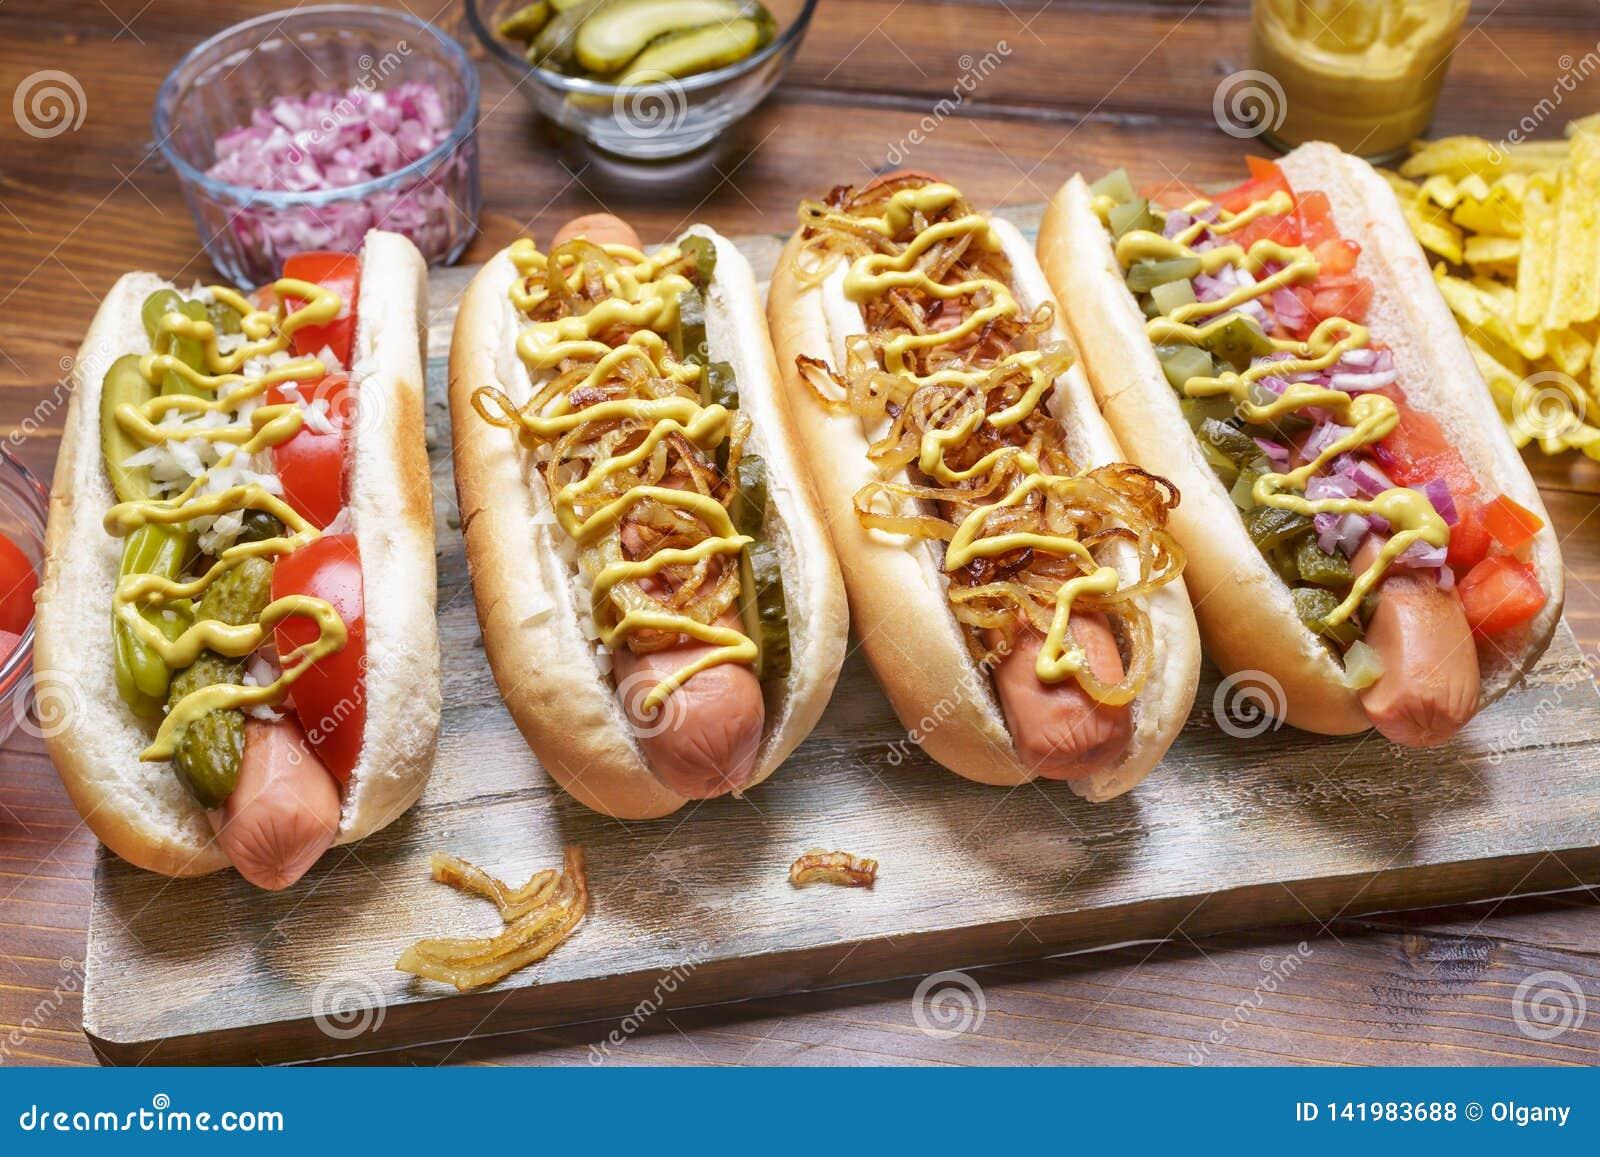 O grupo de gourmet delicioso grelhou cachorros quentes